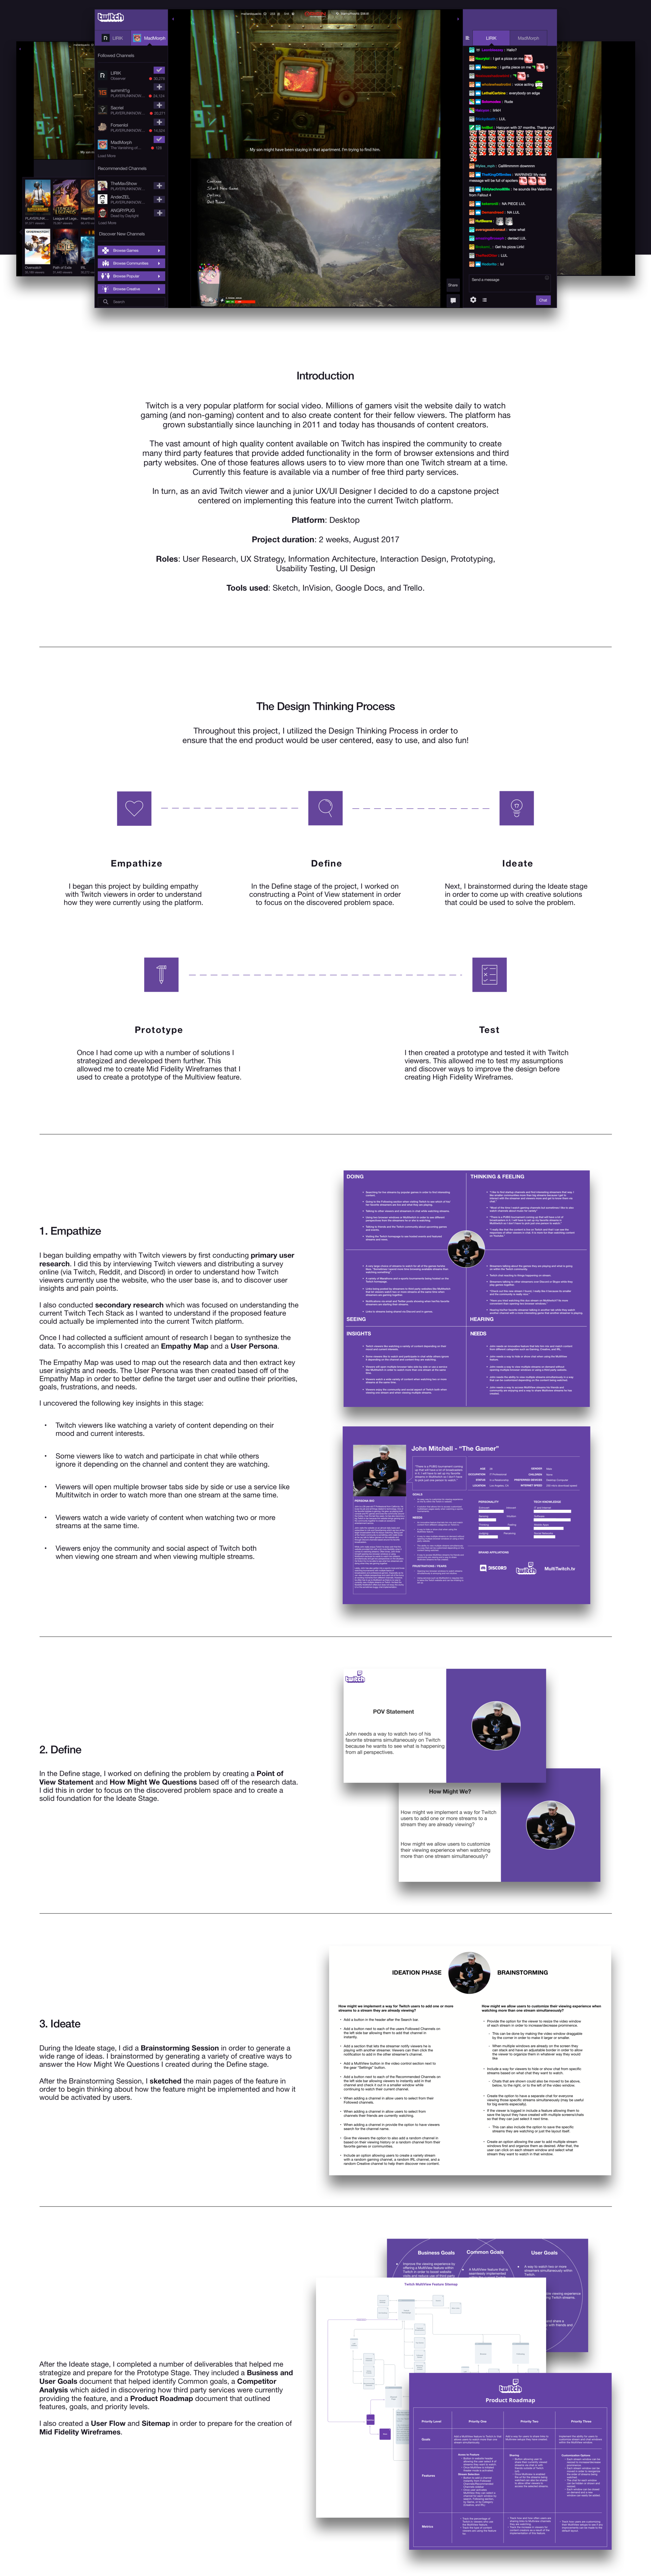 Twitch Multiview Page 1 (Portfolio Version).png